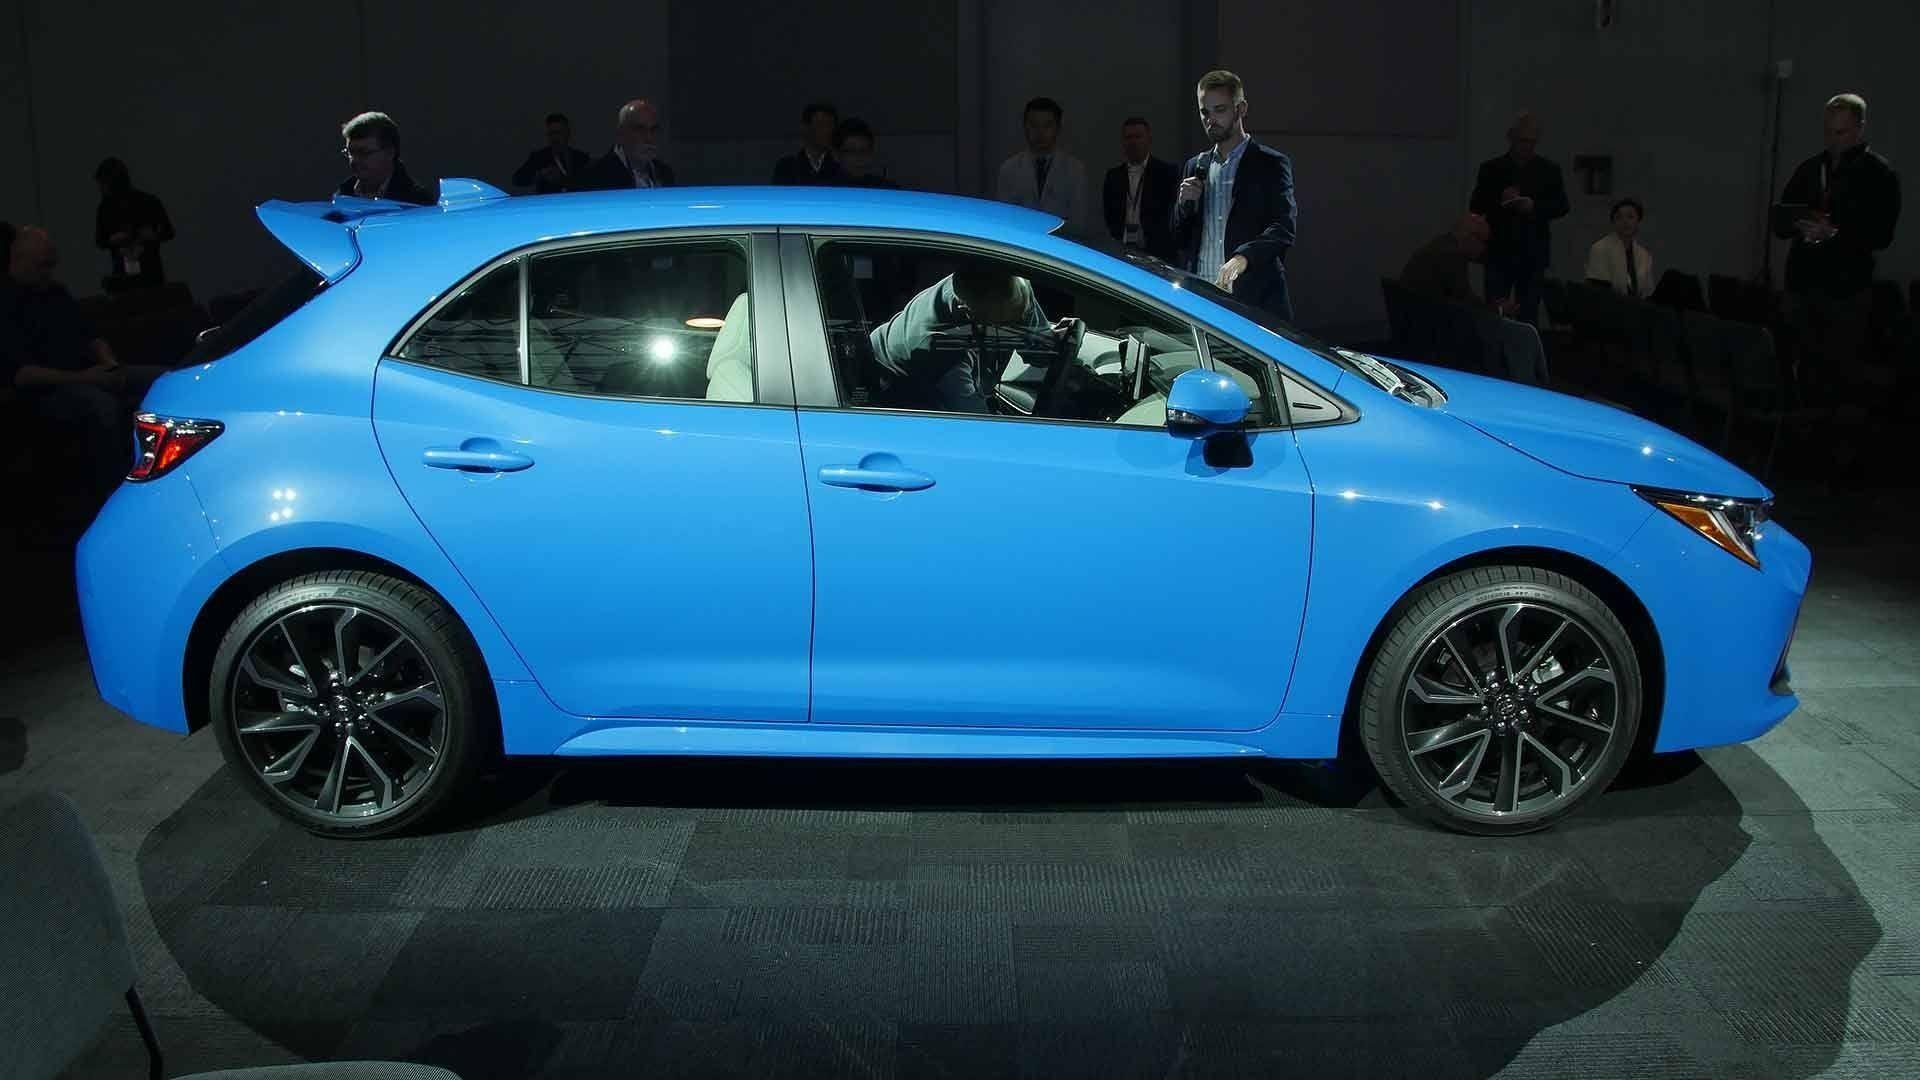 2019 Toyota Carolla Exterior And Interior Review Toyota Corolla Toyota Corolla Hatchback Corolla Hatchback